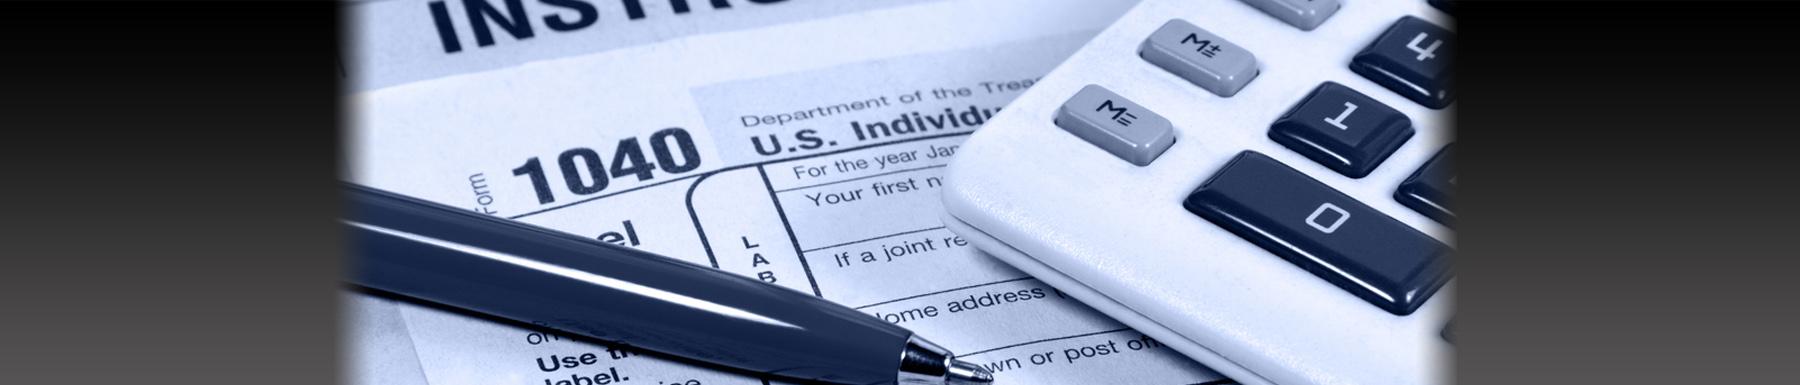 Radke Mohrhauser Llc Tax Preparation Accounting Services